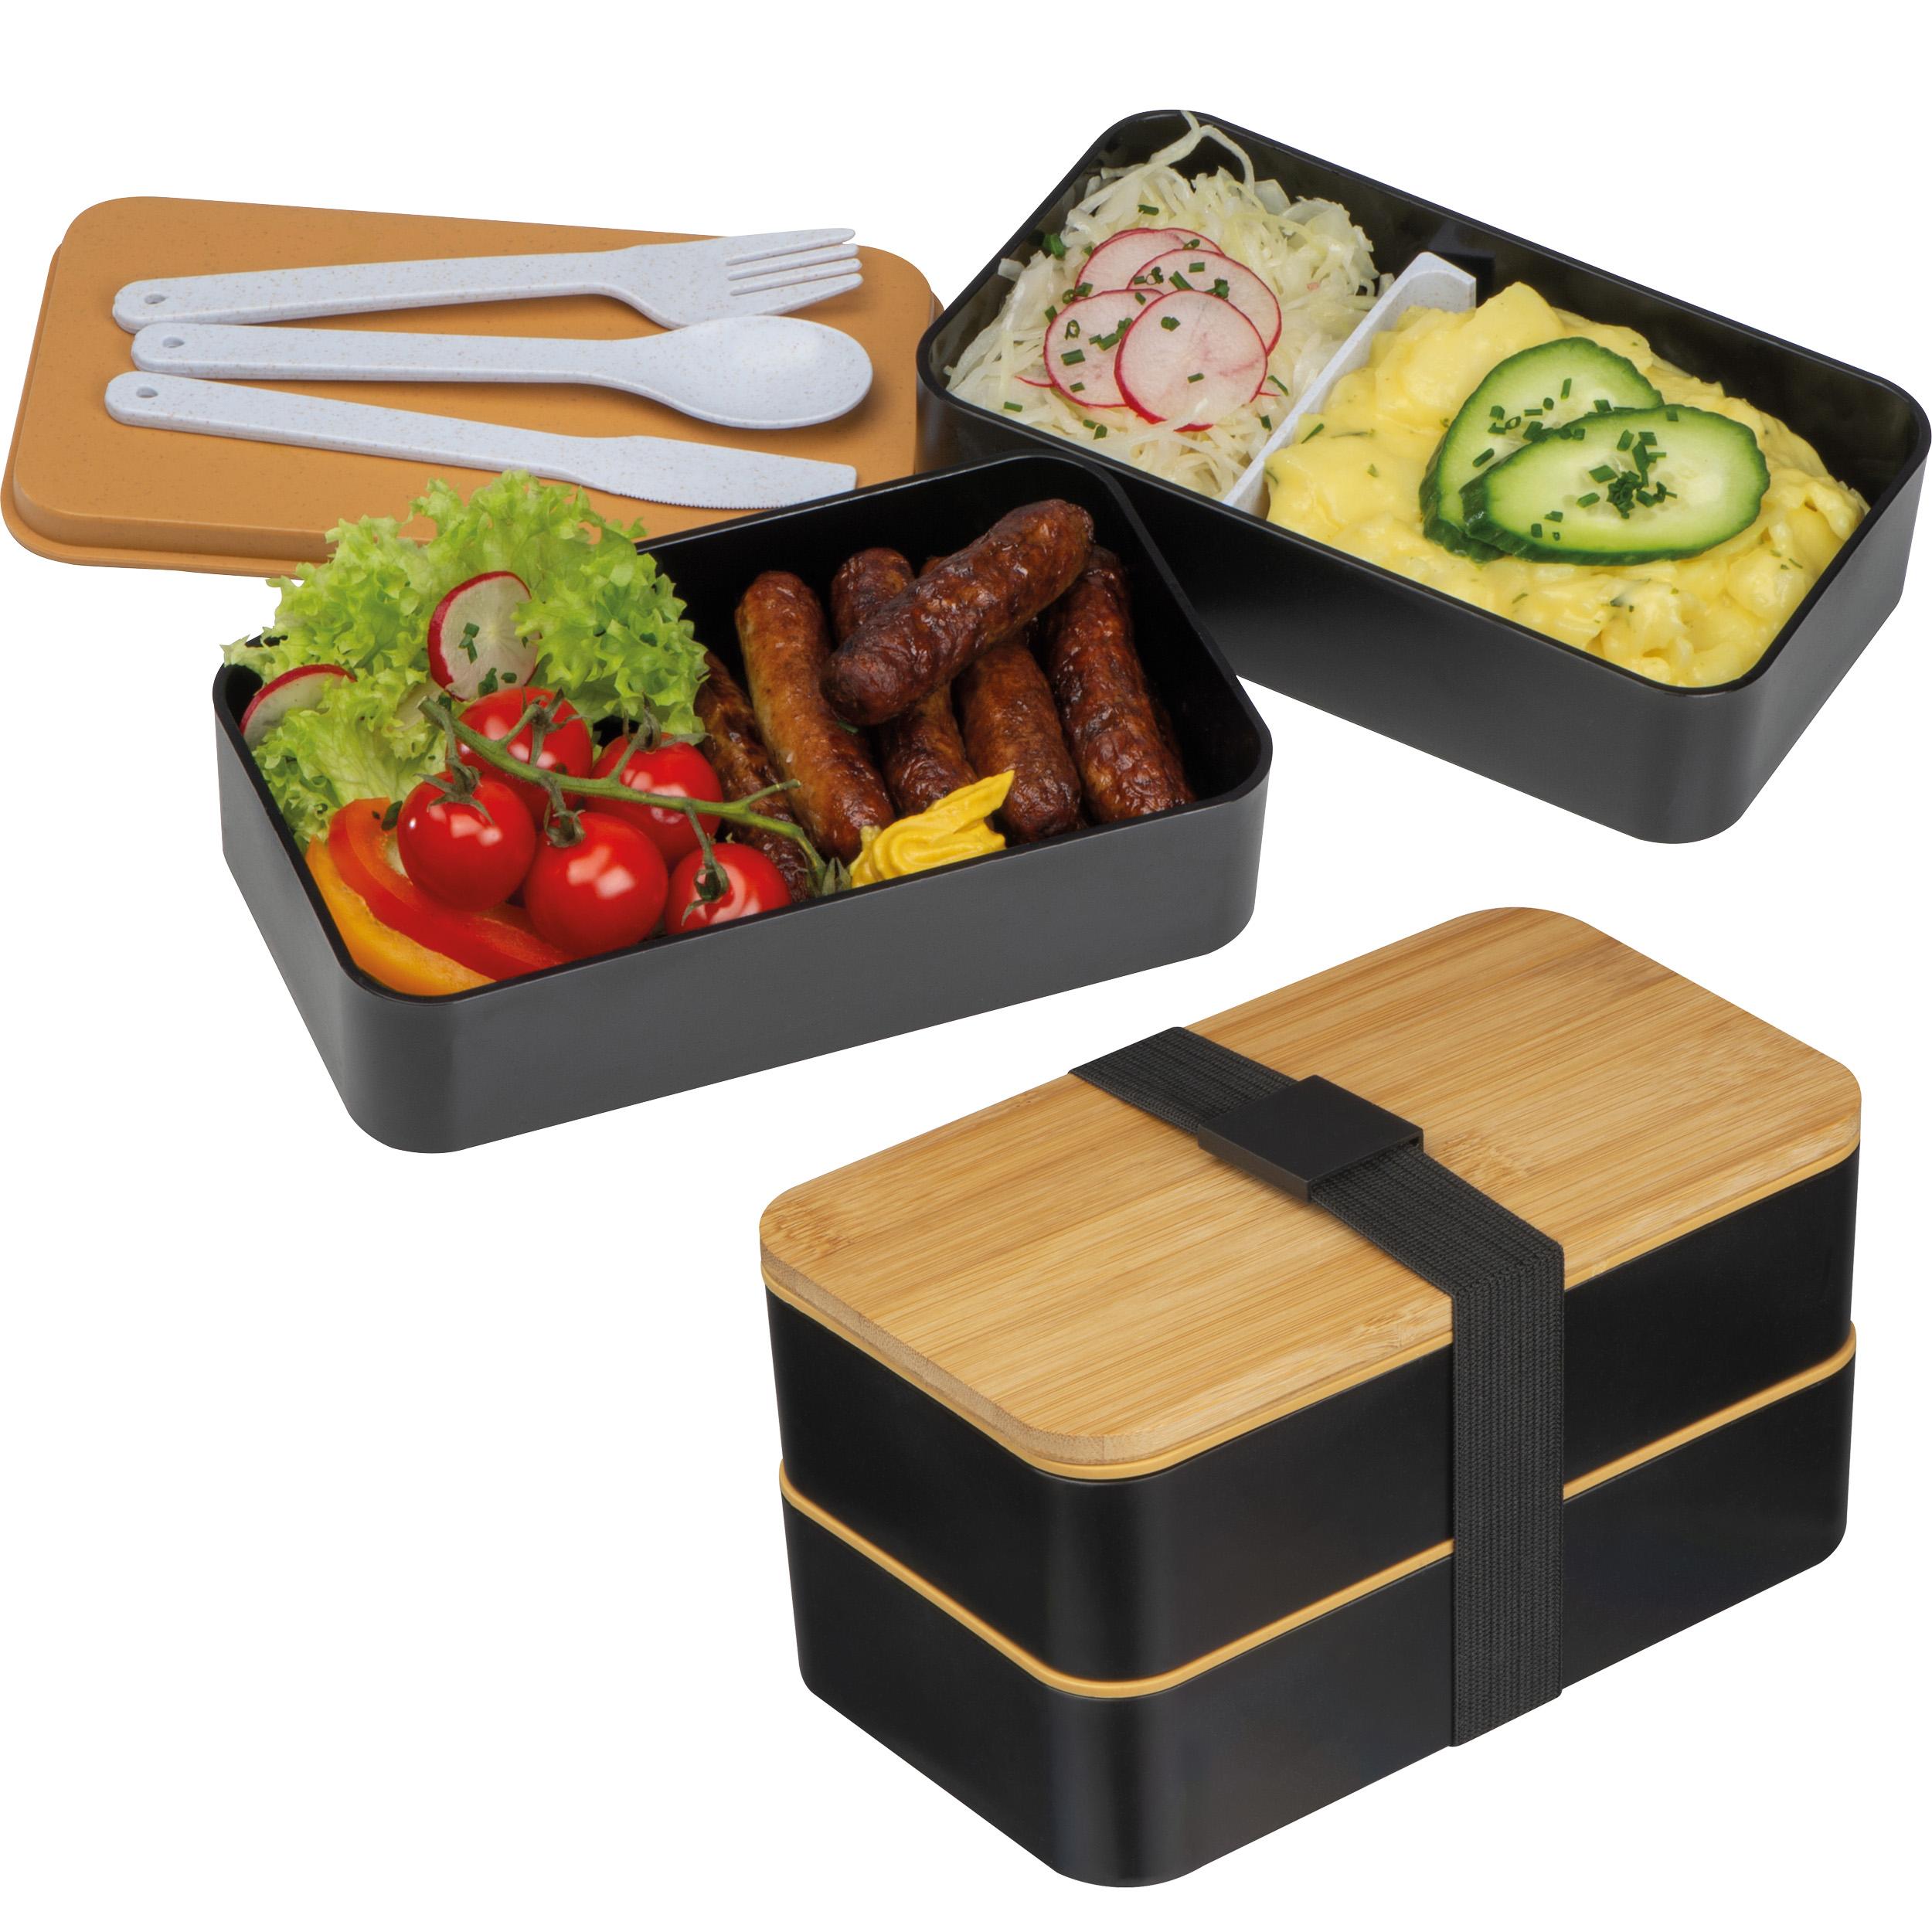 Eco-friendly 2-Level wheatstrawlunchbox